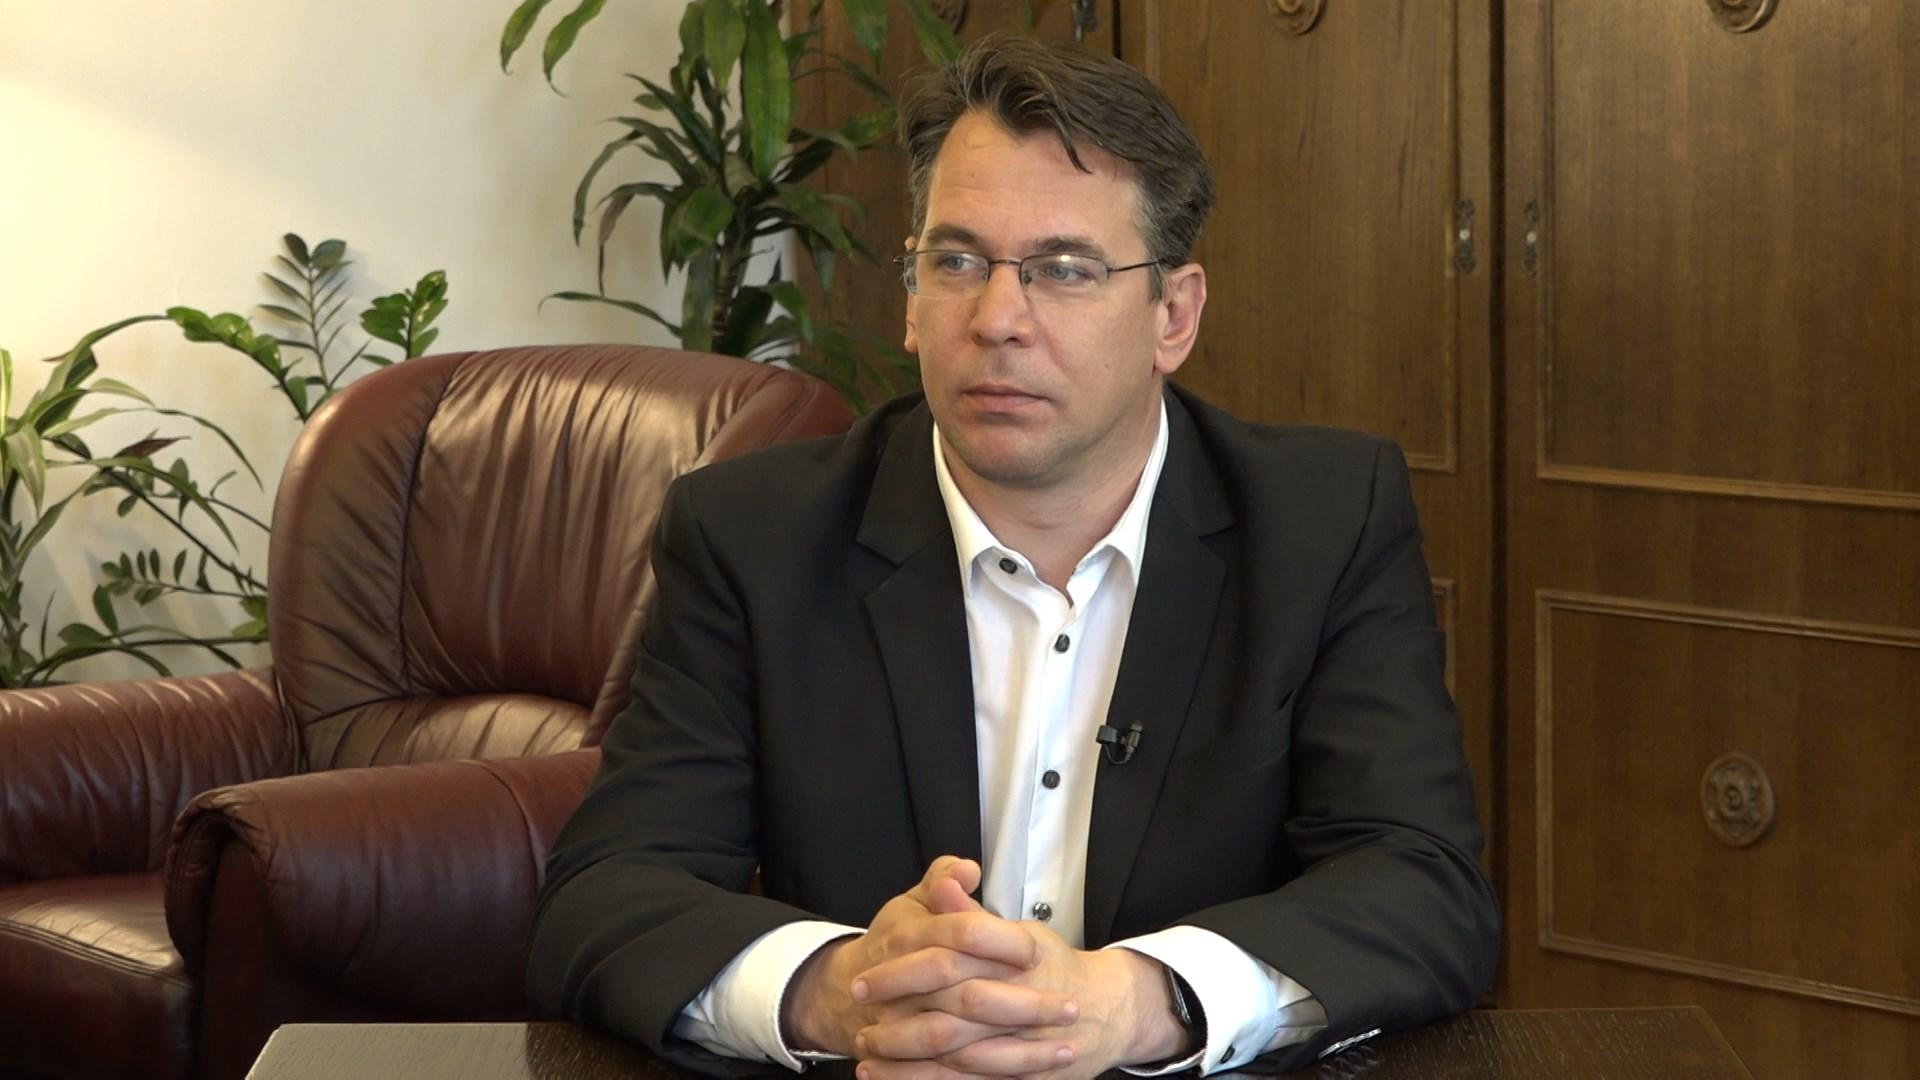 Fogadóóra – 2020.03.23. - Vendég: Mirkóczki Ádám polgármester